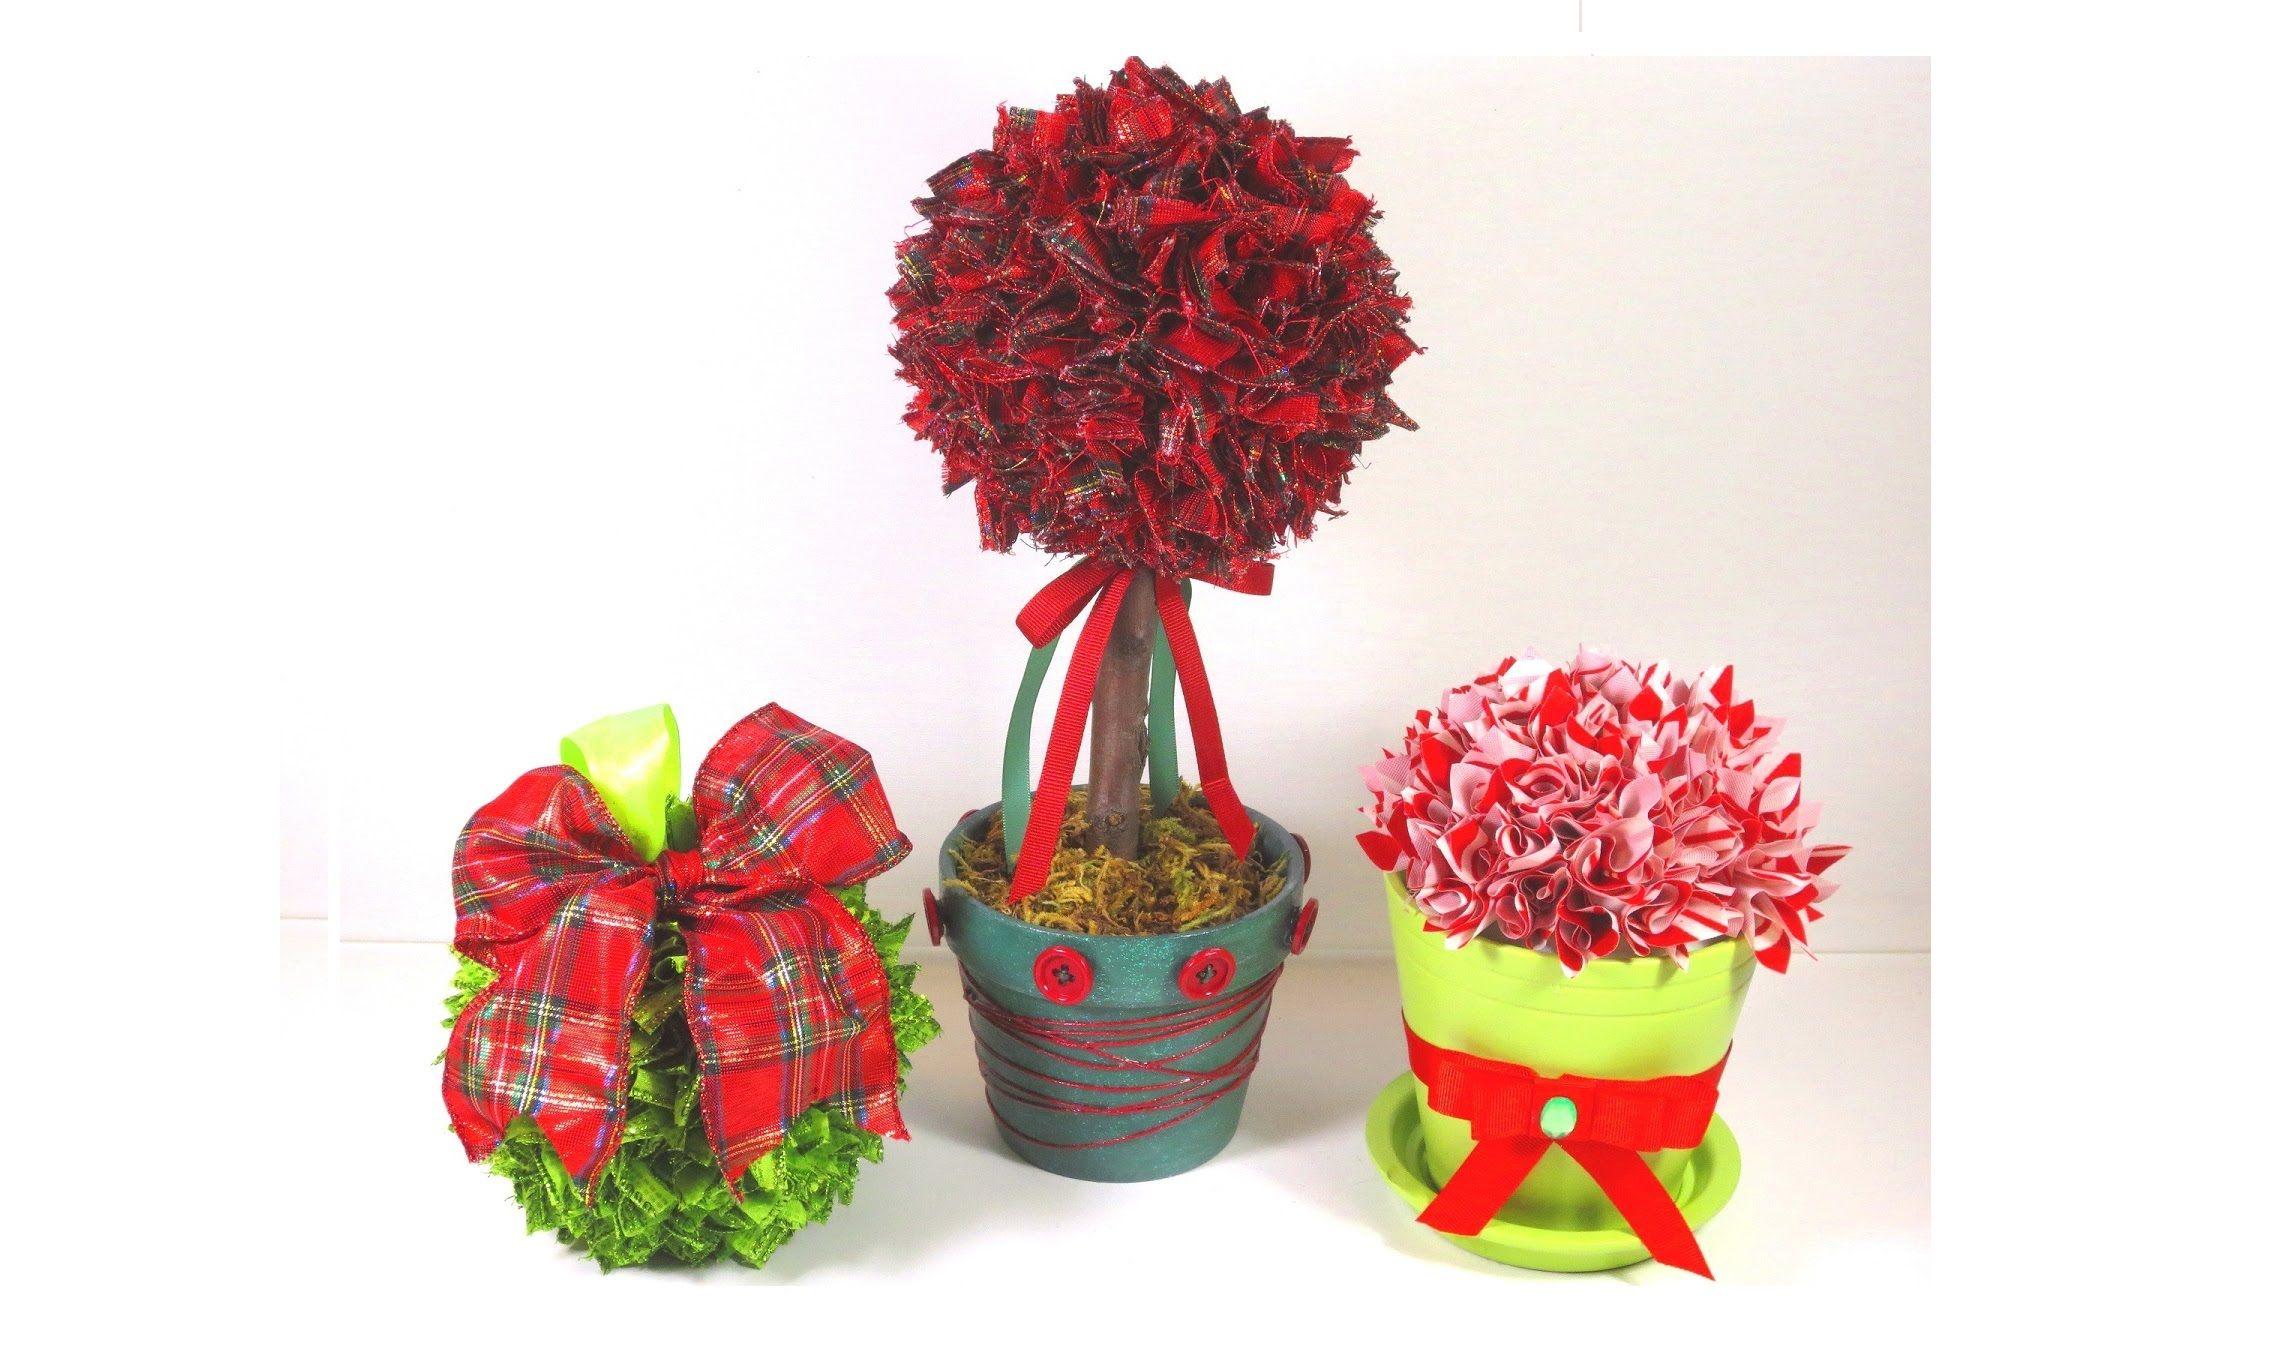 Diy christmas tree ribbon topiary and ornament decorations diy christmas tree ribbon topiary and ornament decorations solutioingenieria Image collections